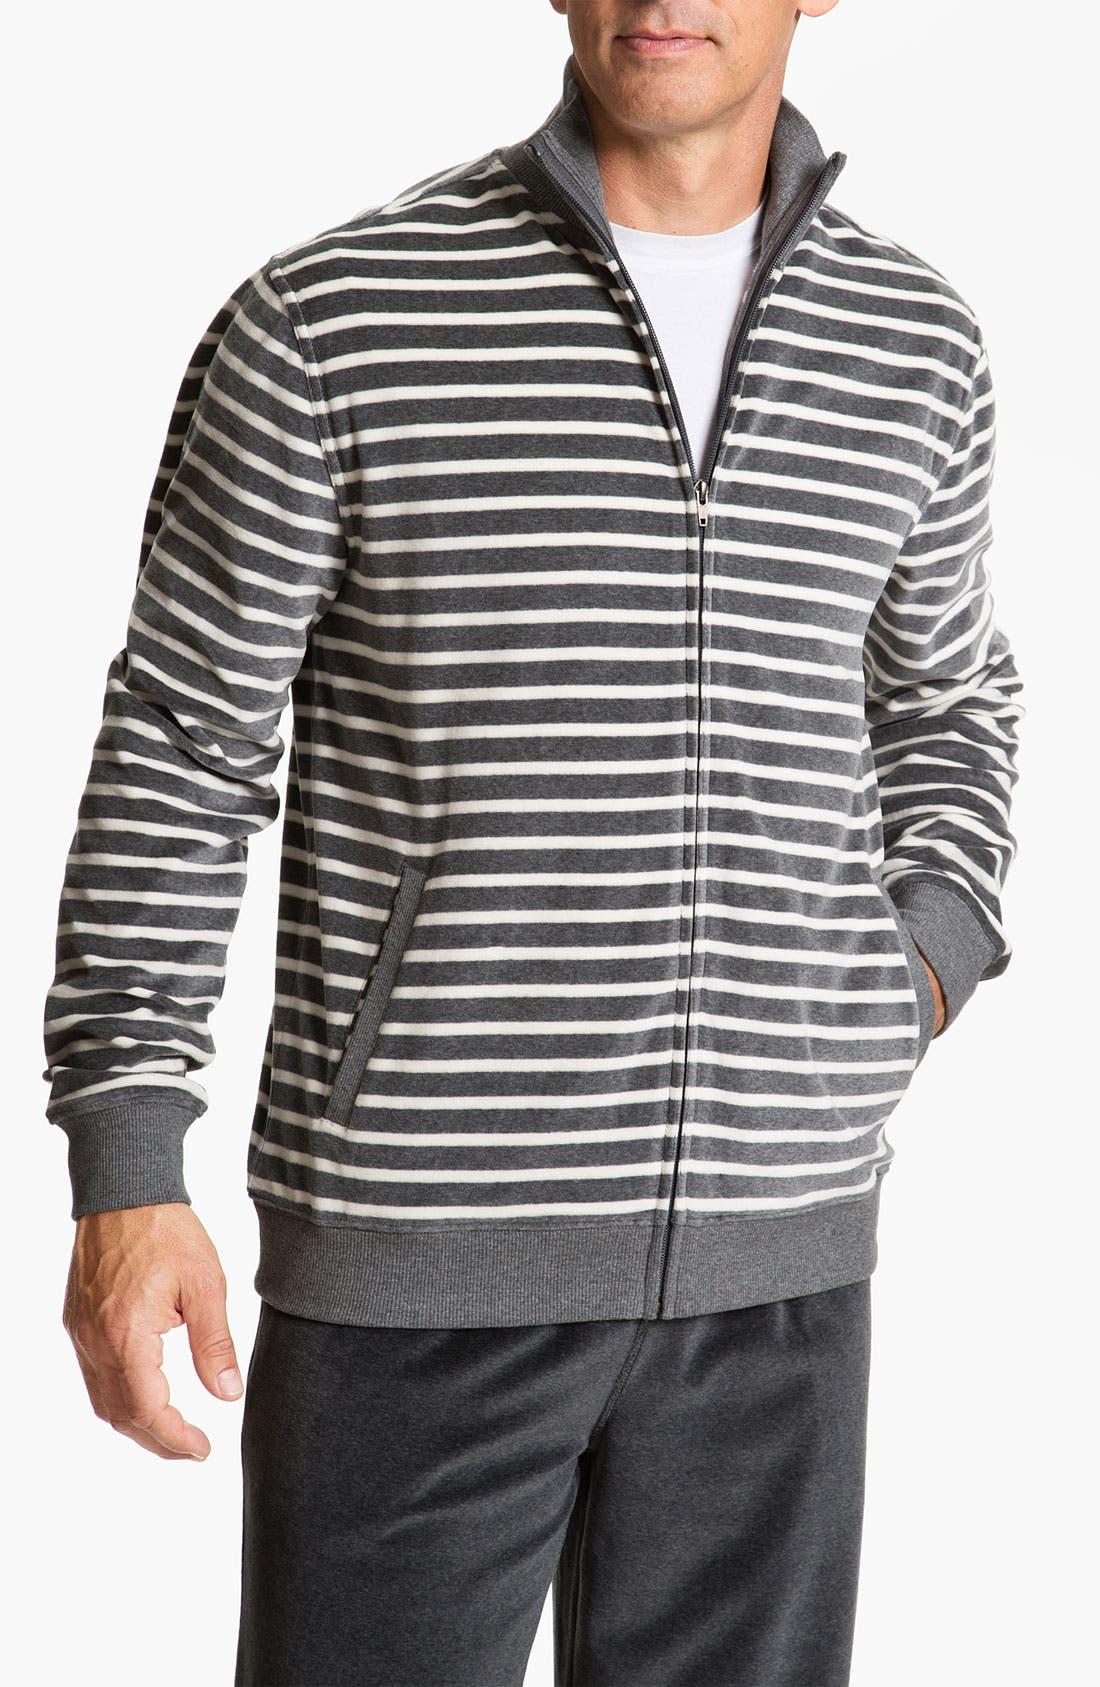 Alternate Image 1 Selected - Daniel Buchler Yarn-Dyed Stripe Velour Track Jacket